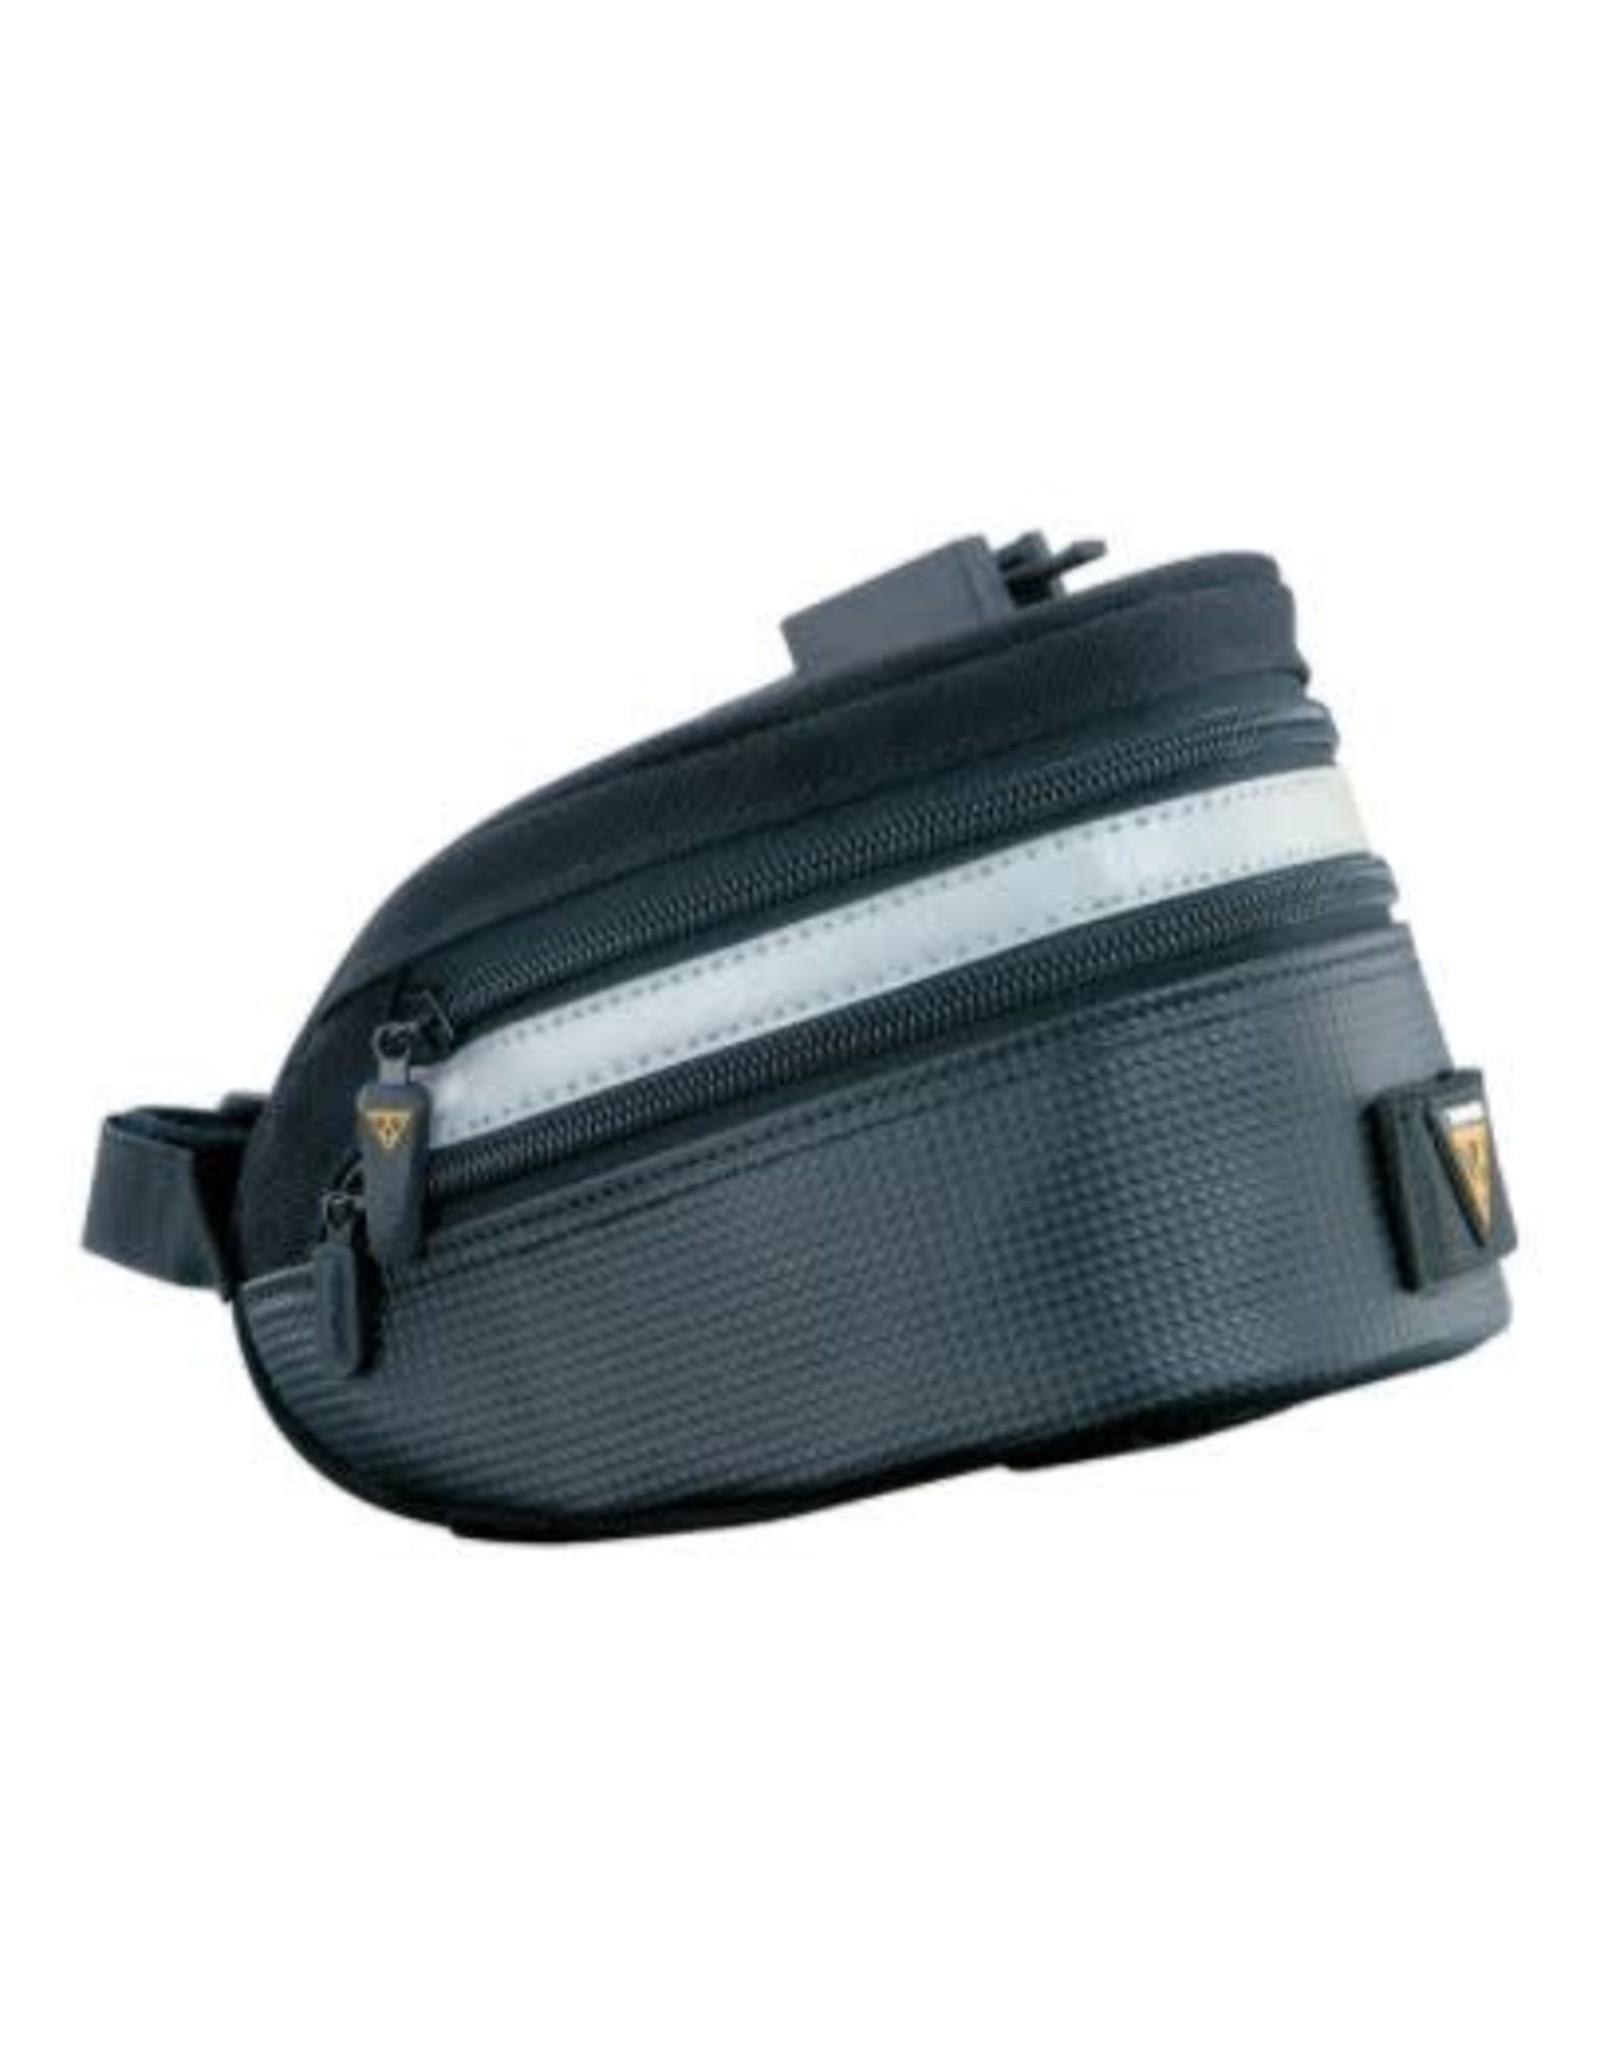 Topeak Saddle bag Topeak Wedge